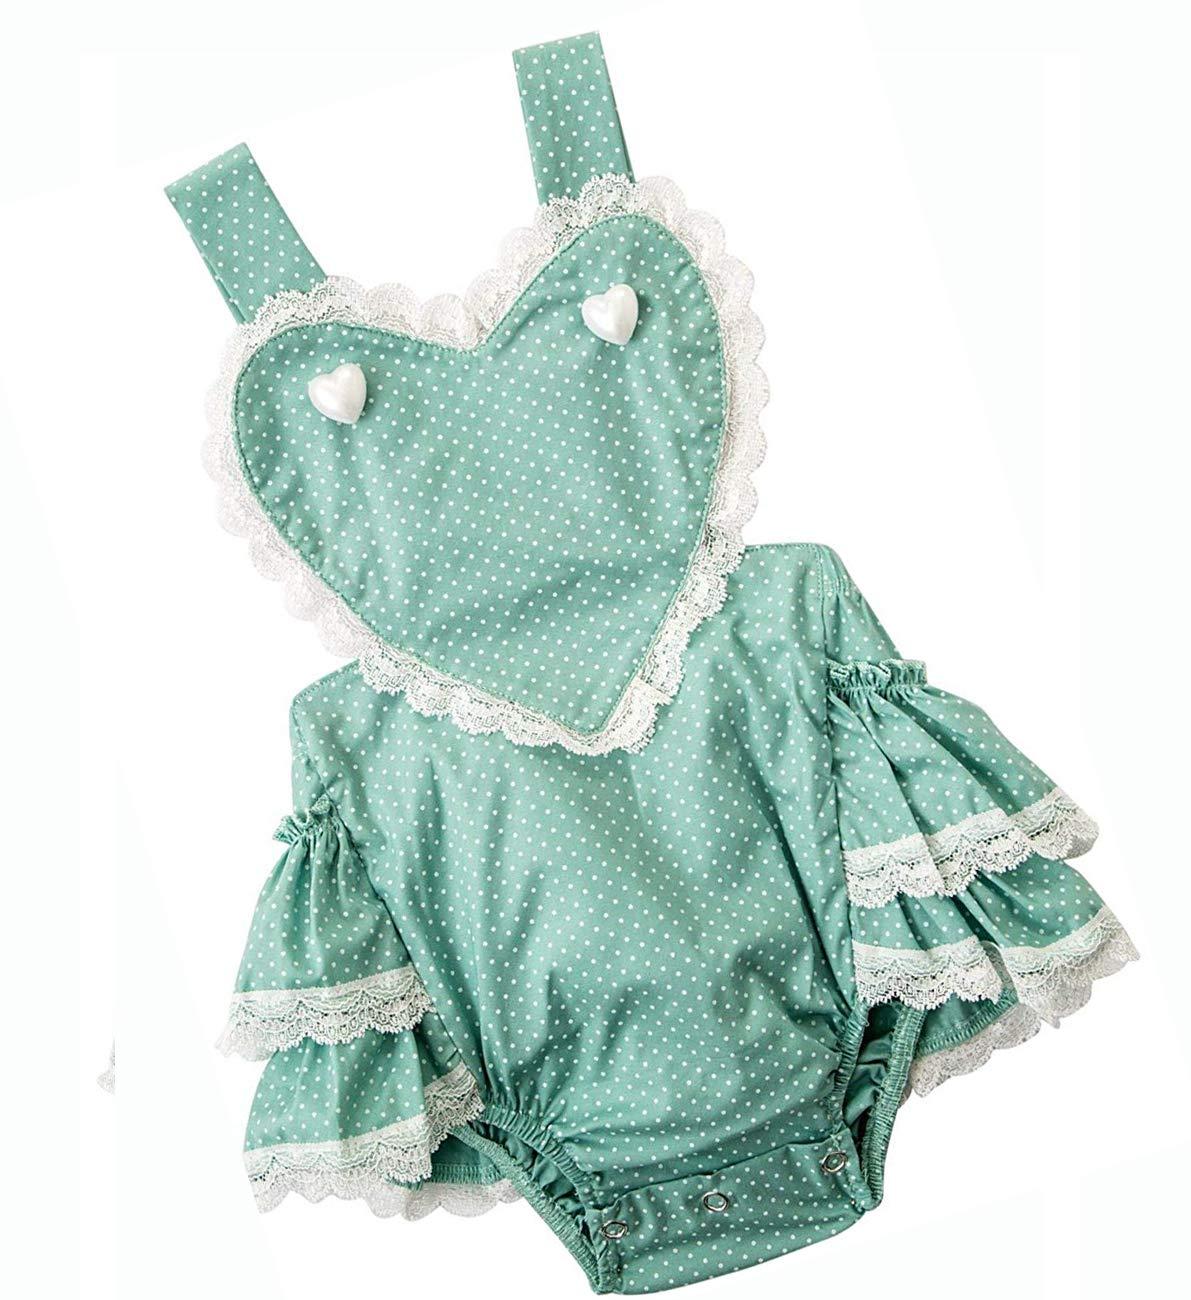 Newborn Baby Girl Ruffle Sleeveless Romper Heart Bodysuit Jumpsuit Outfit Summer